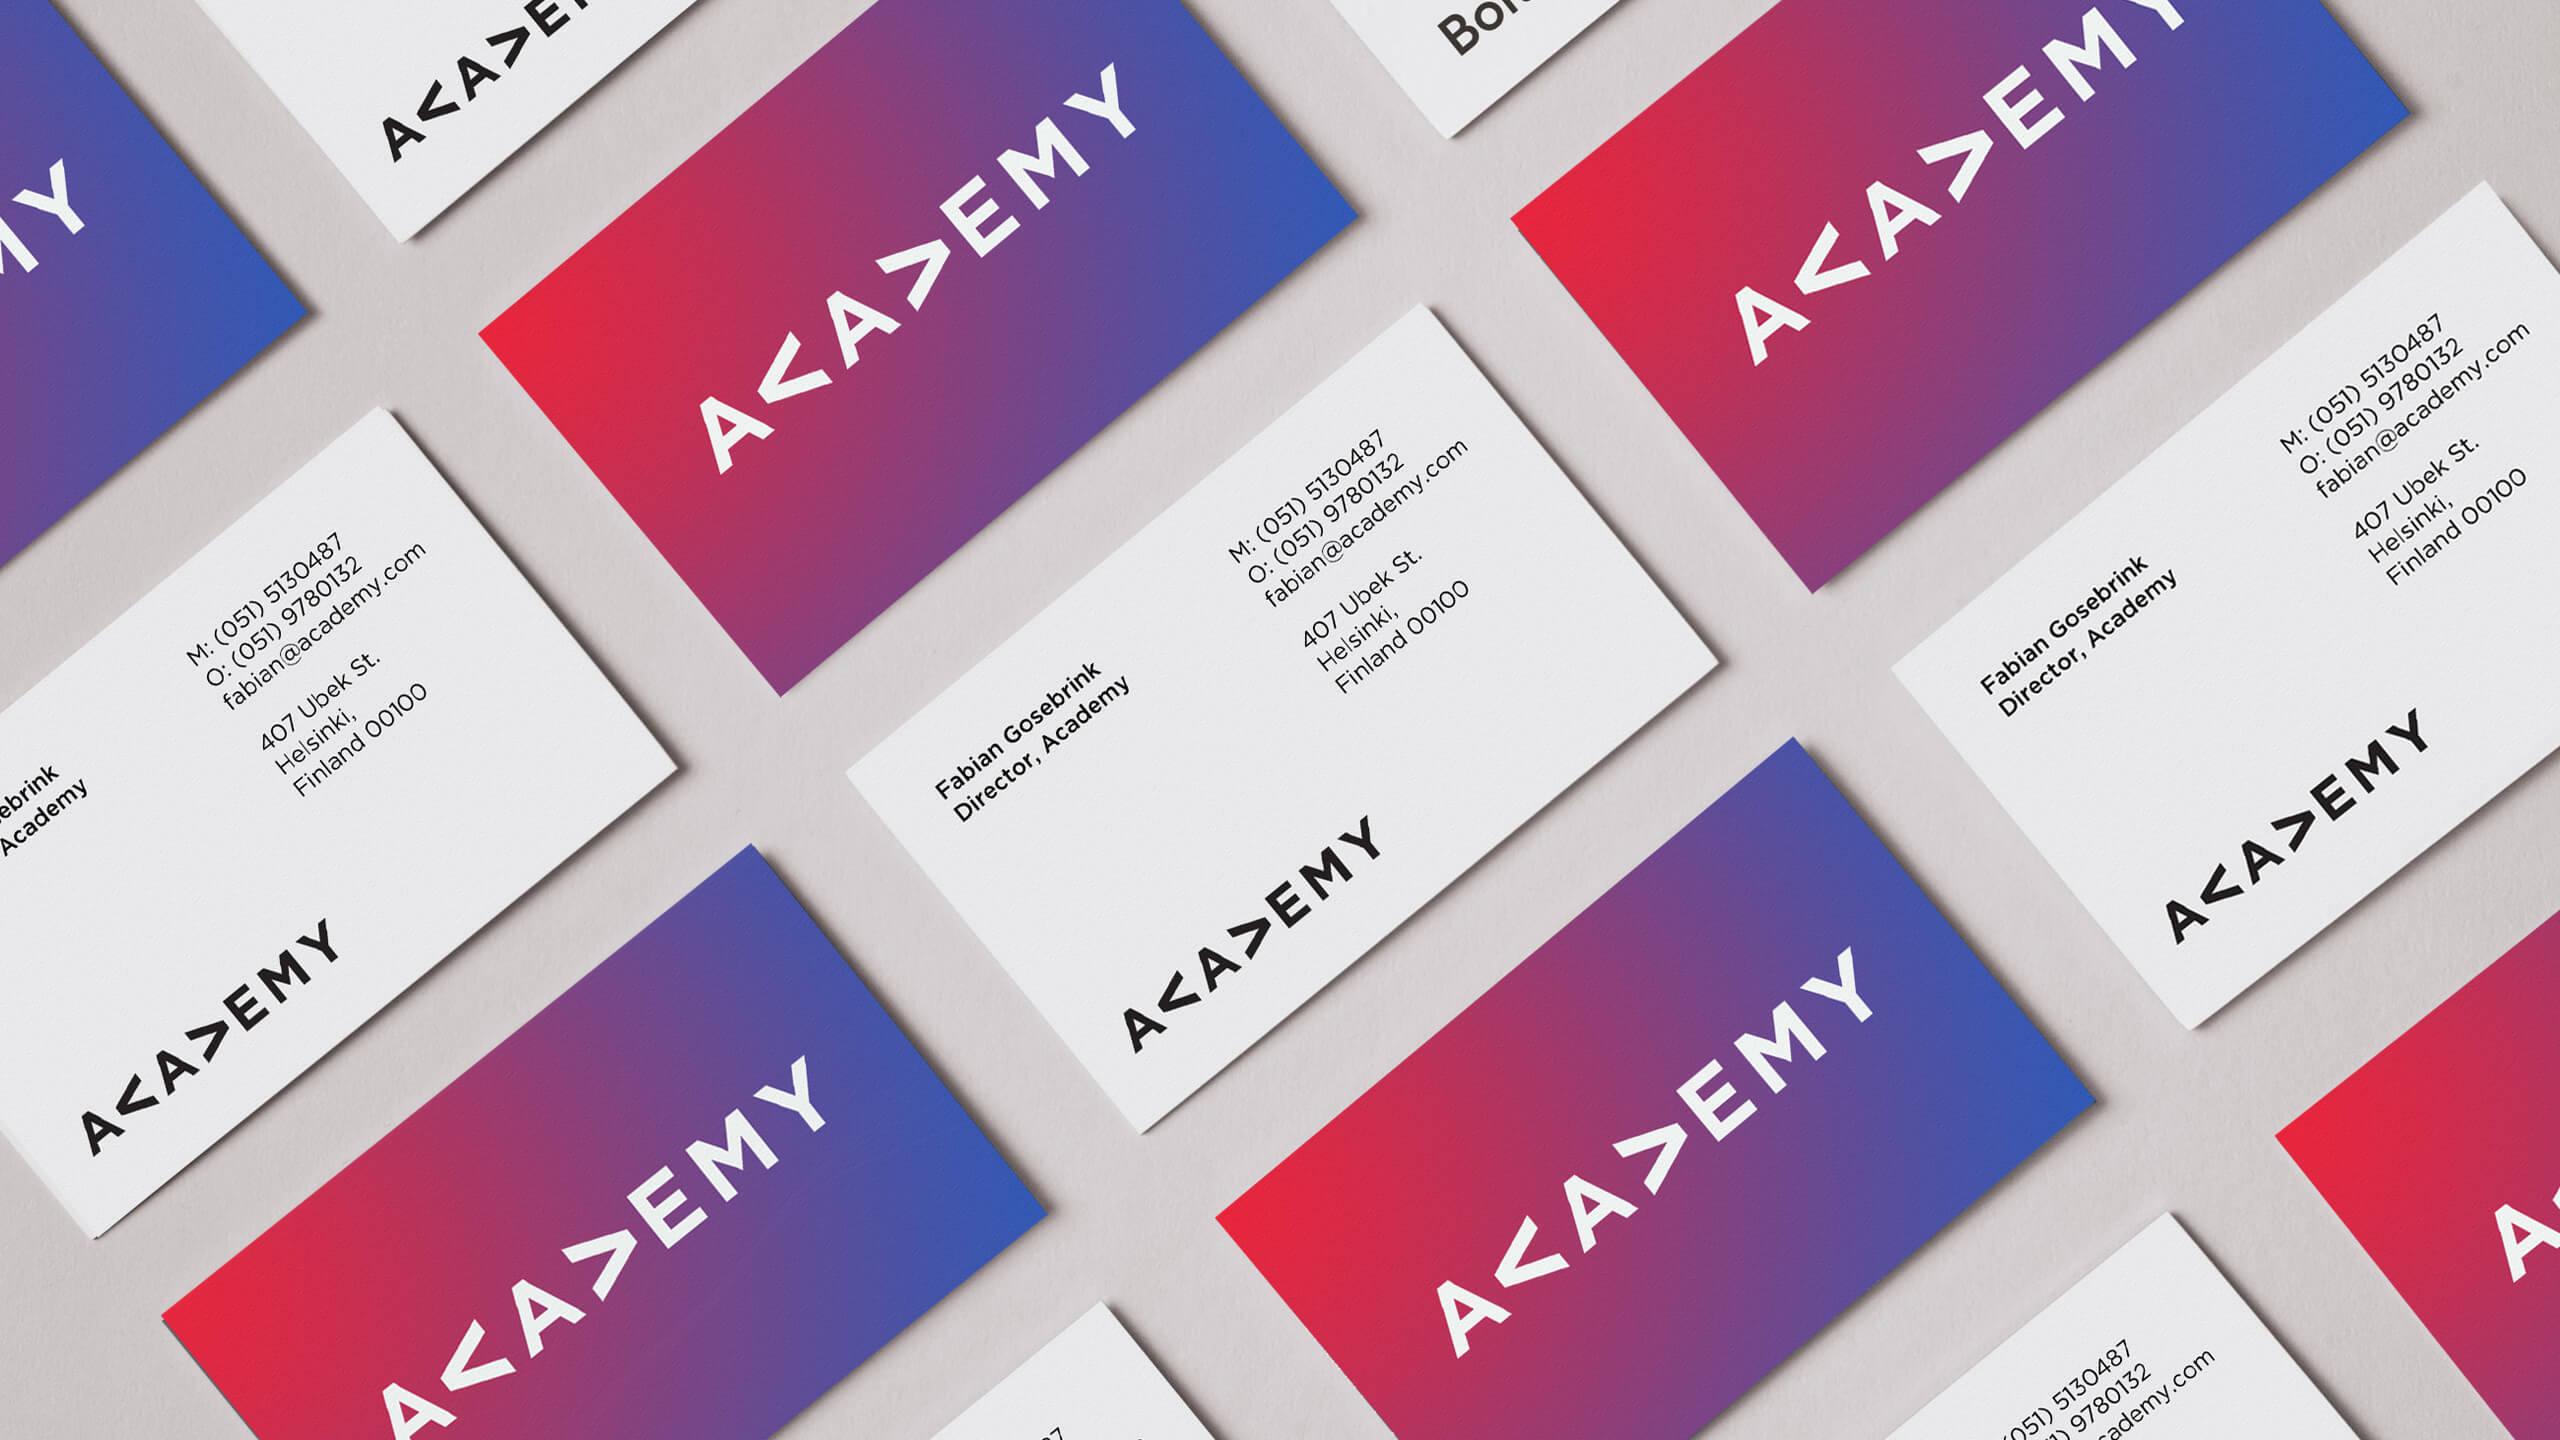 Academy showcase